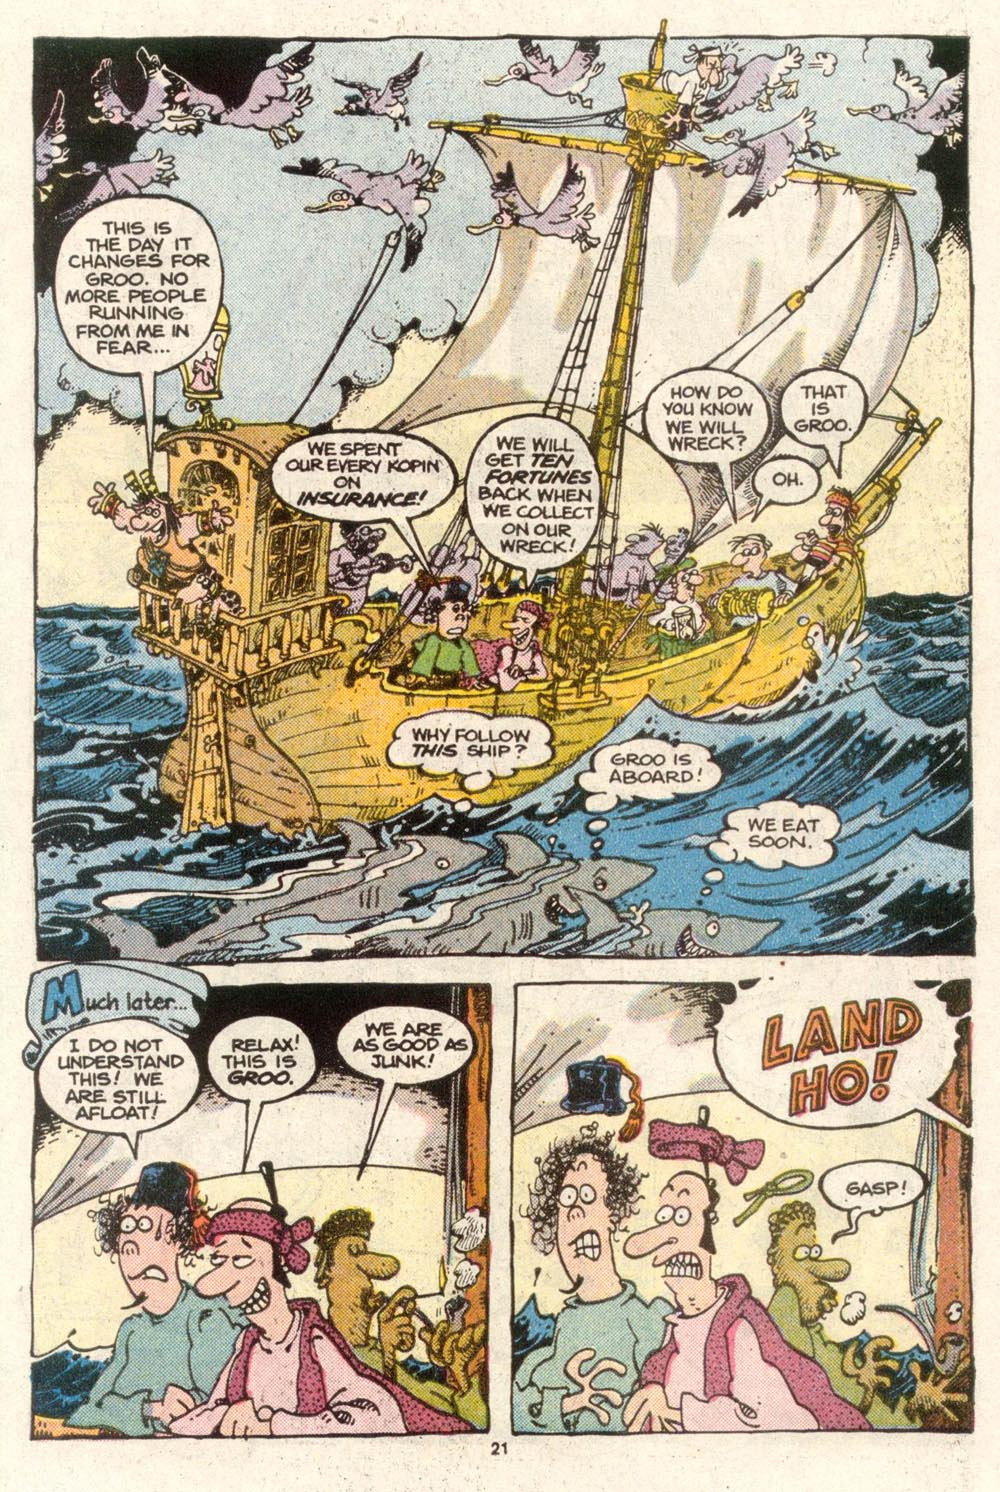 Read online Sergio Aragonés Groo the Wanderer comic -  Issue #48 - 22